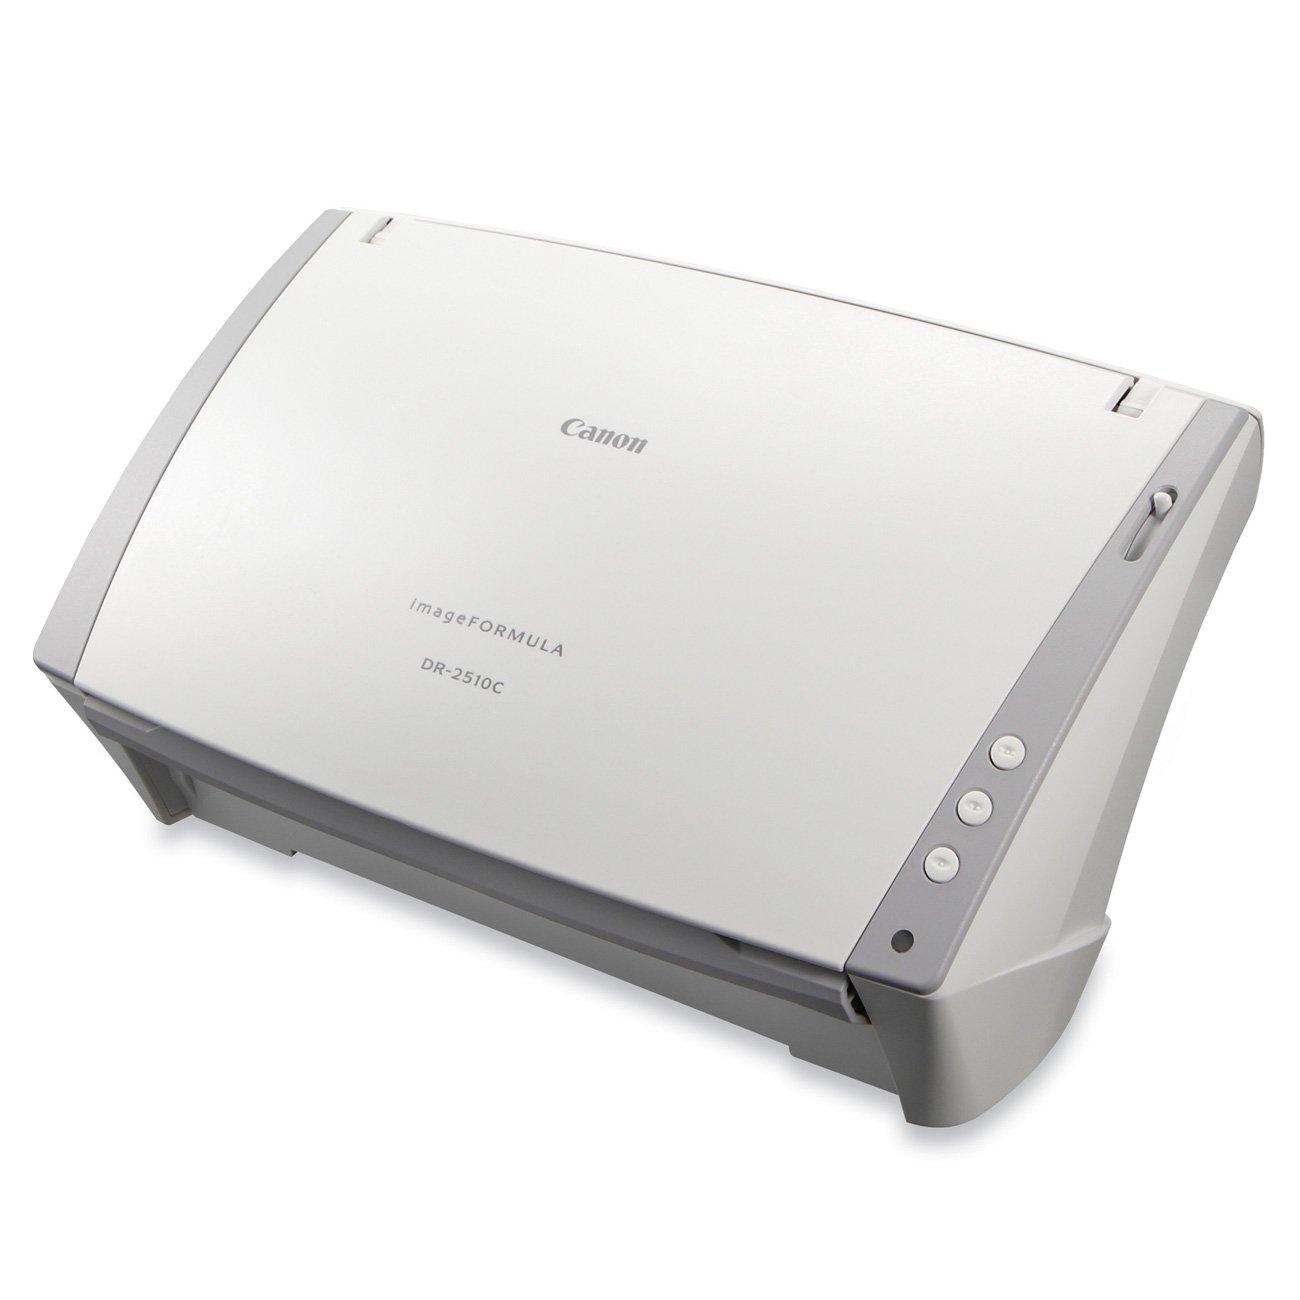 Canon imageFORMULA DR-2510C Office Document Scanner